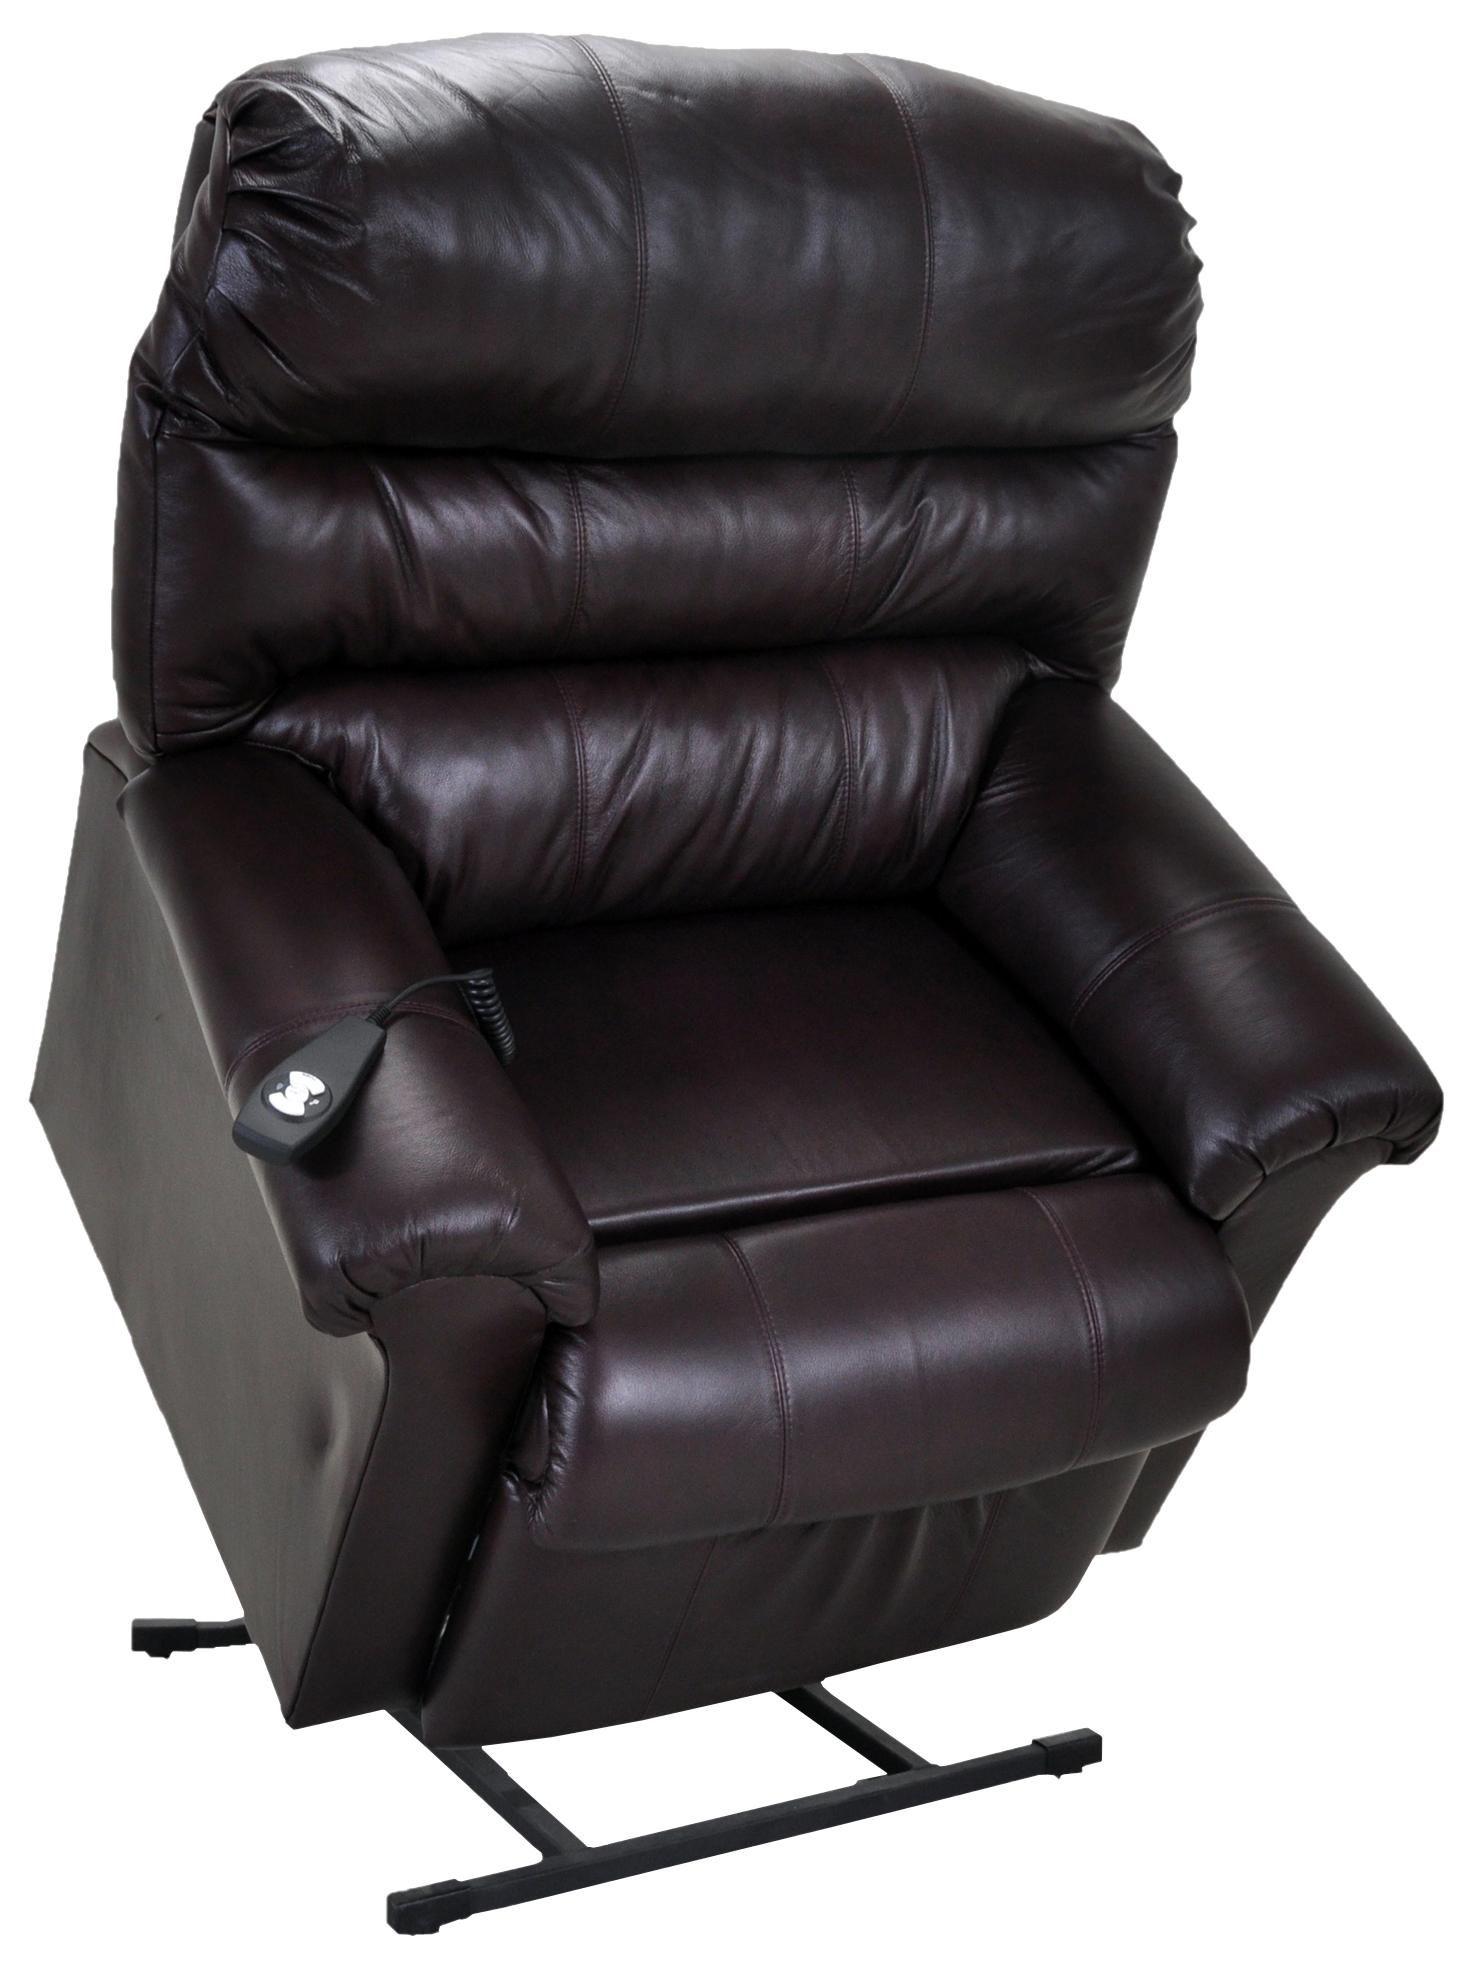 Lift Chair Recliners Recliner Lift Chairs Lift Chair Recliners